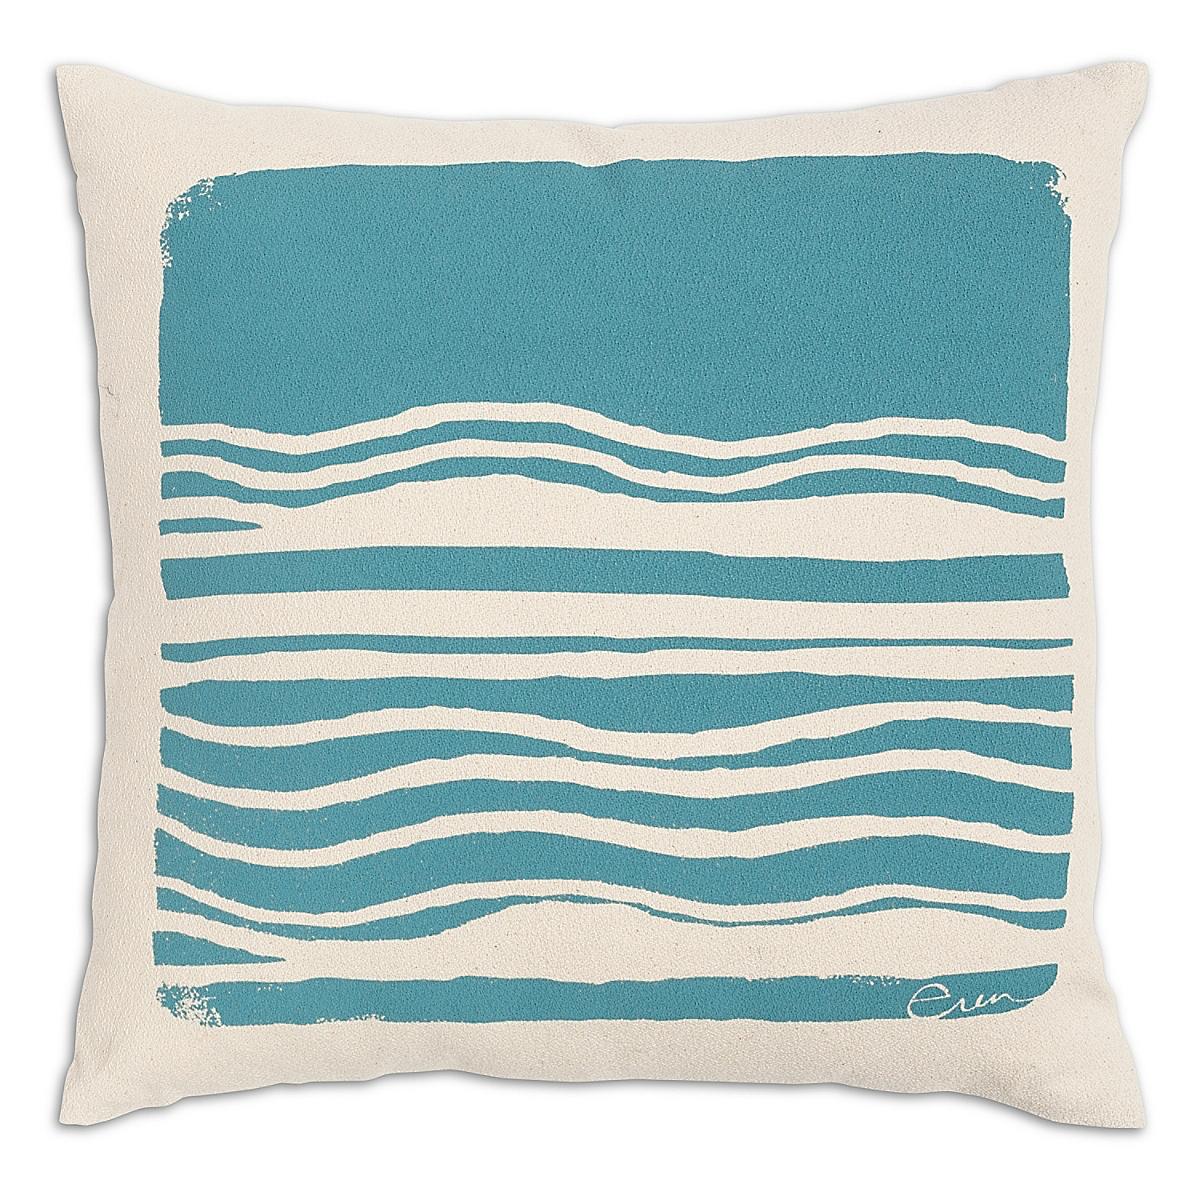 "20"" x 20"" - Wave Pillow: Surf"